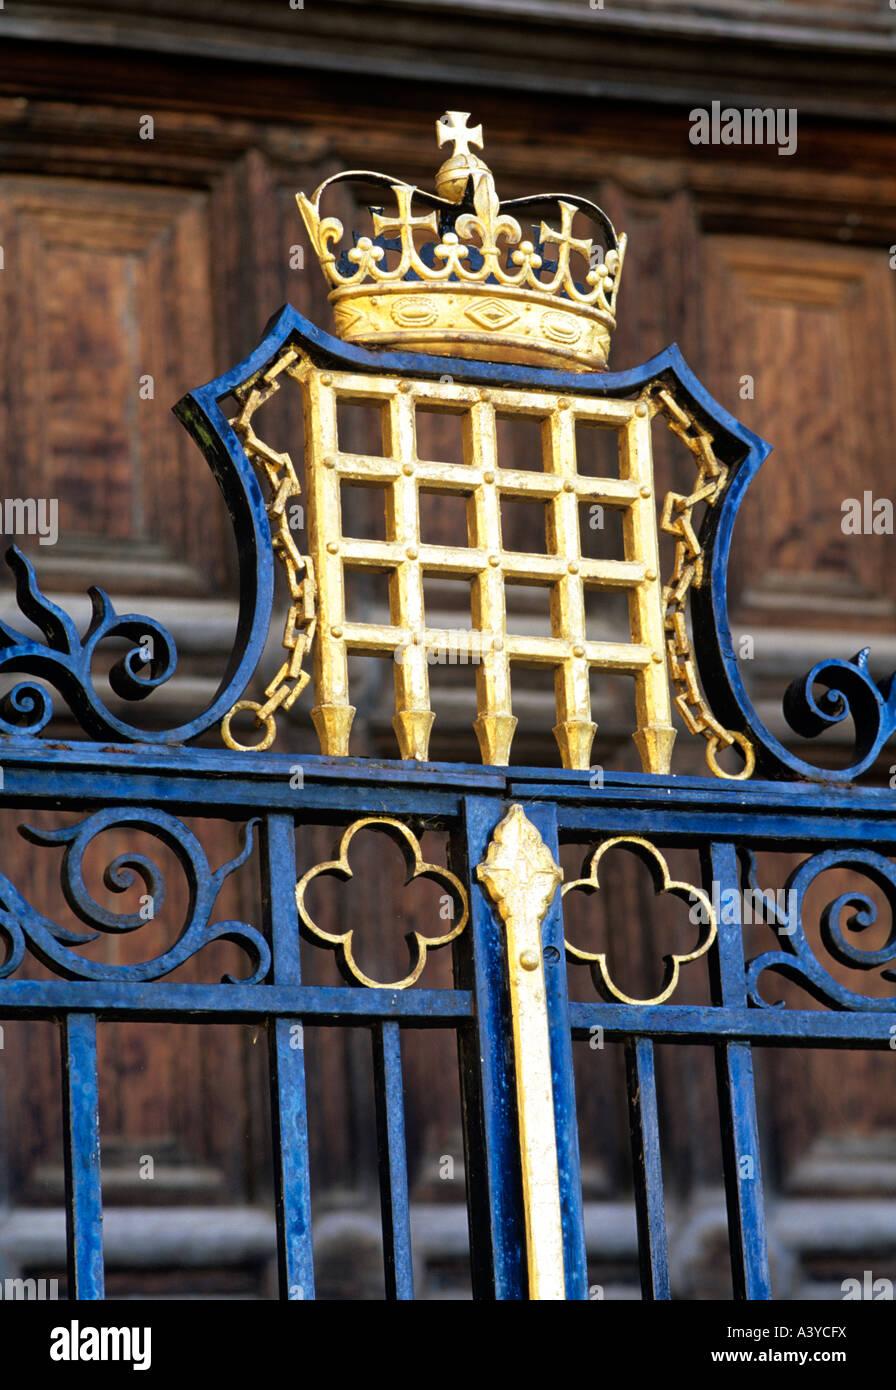 the portcullis on railings in King's College Cambridge ...